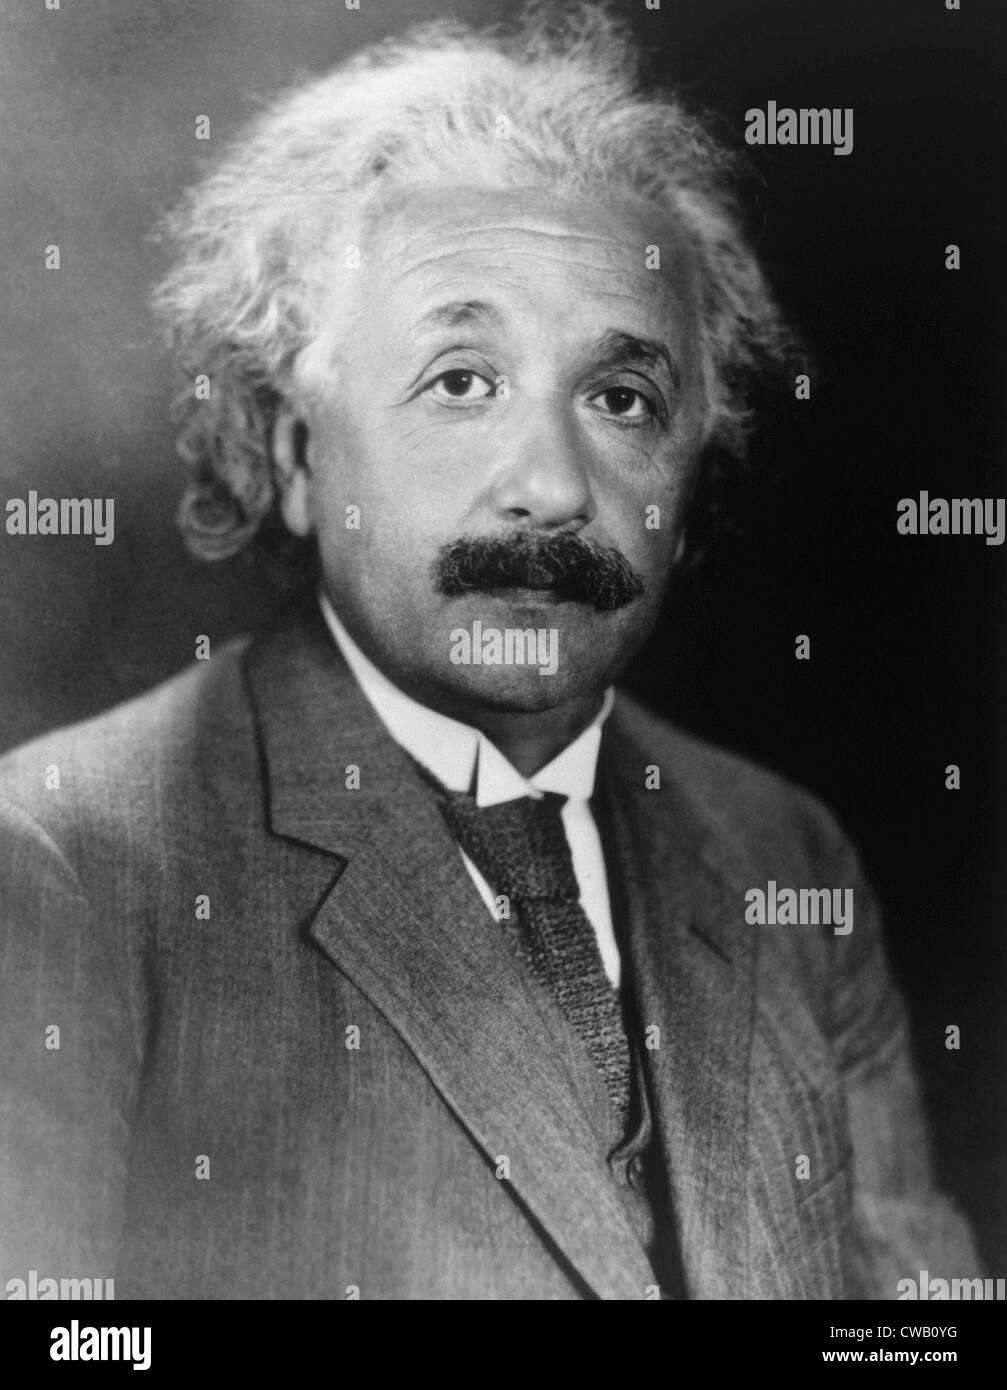 Albert Einstein (1879-1955) - Stock Image